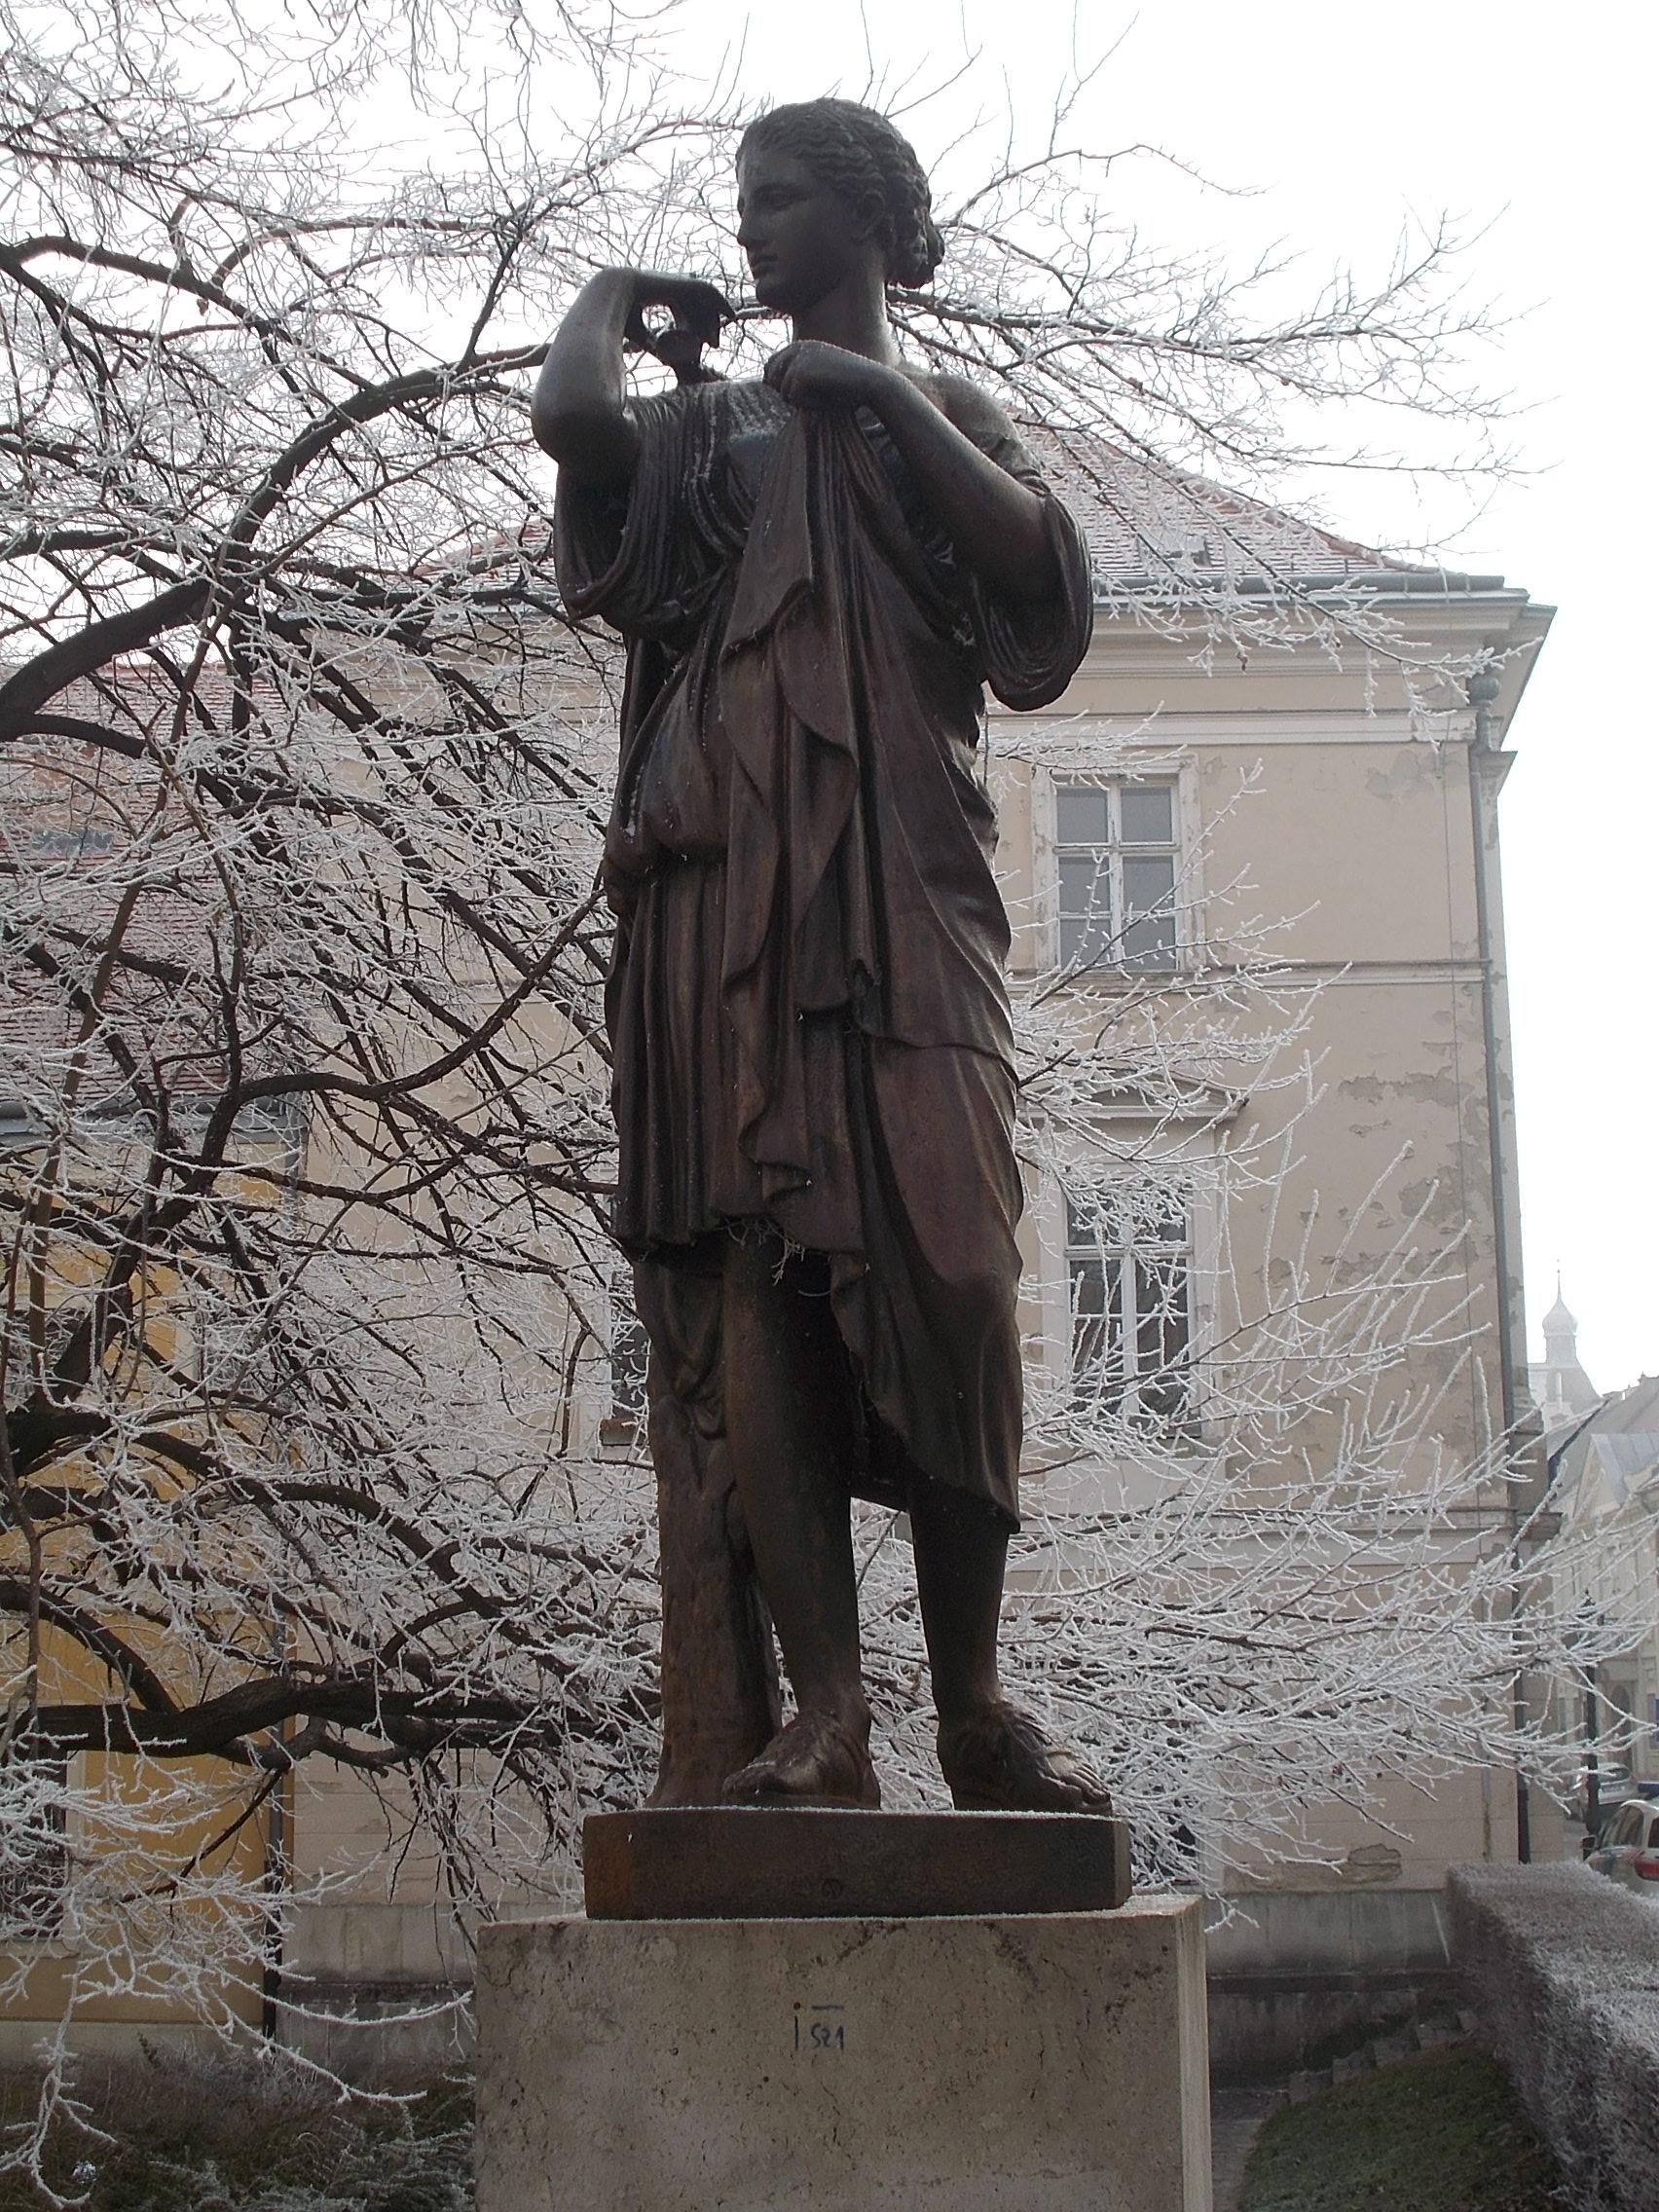 artemis statue diana filefrost artemis statue uri street 2017 budapestjpg